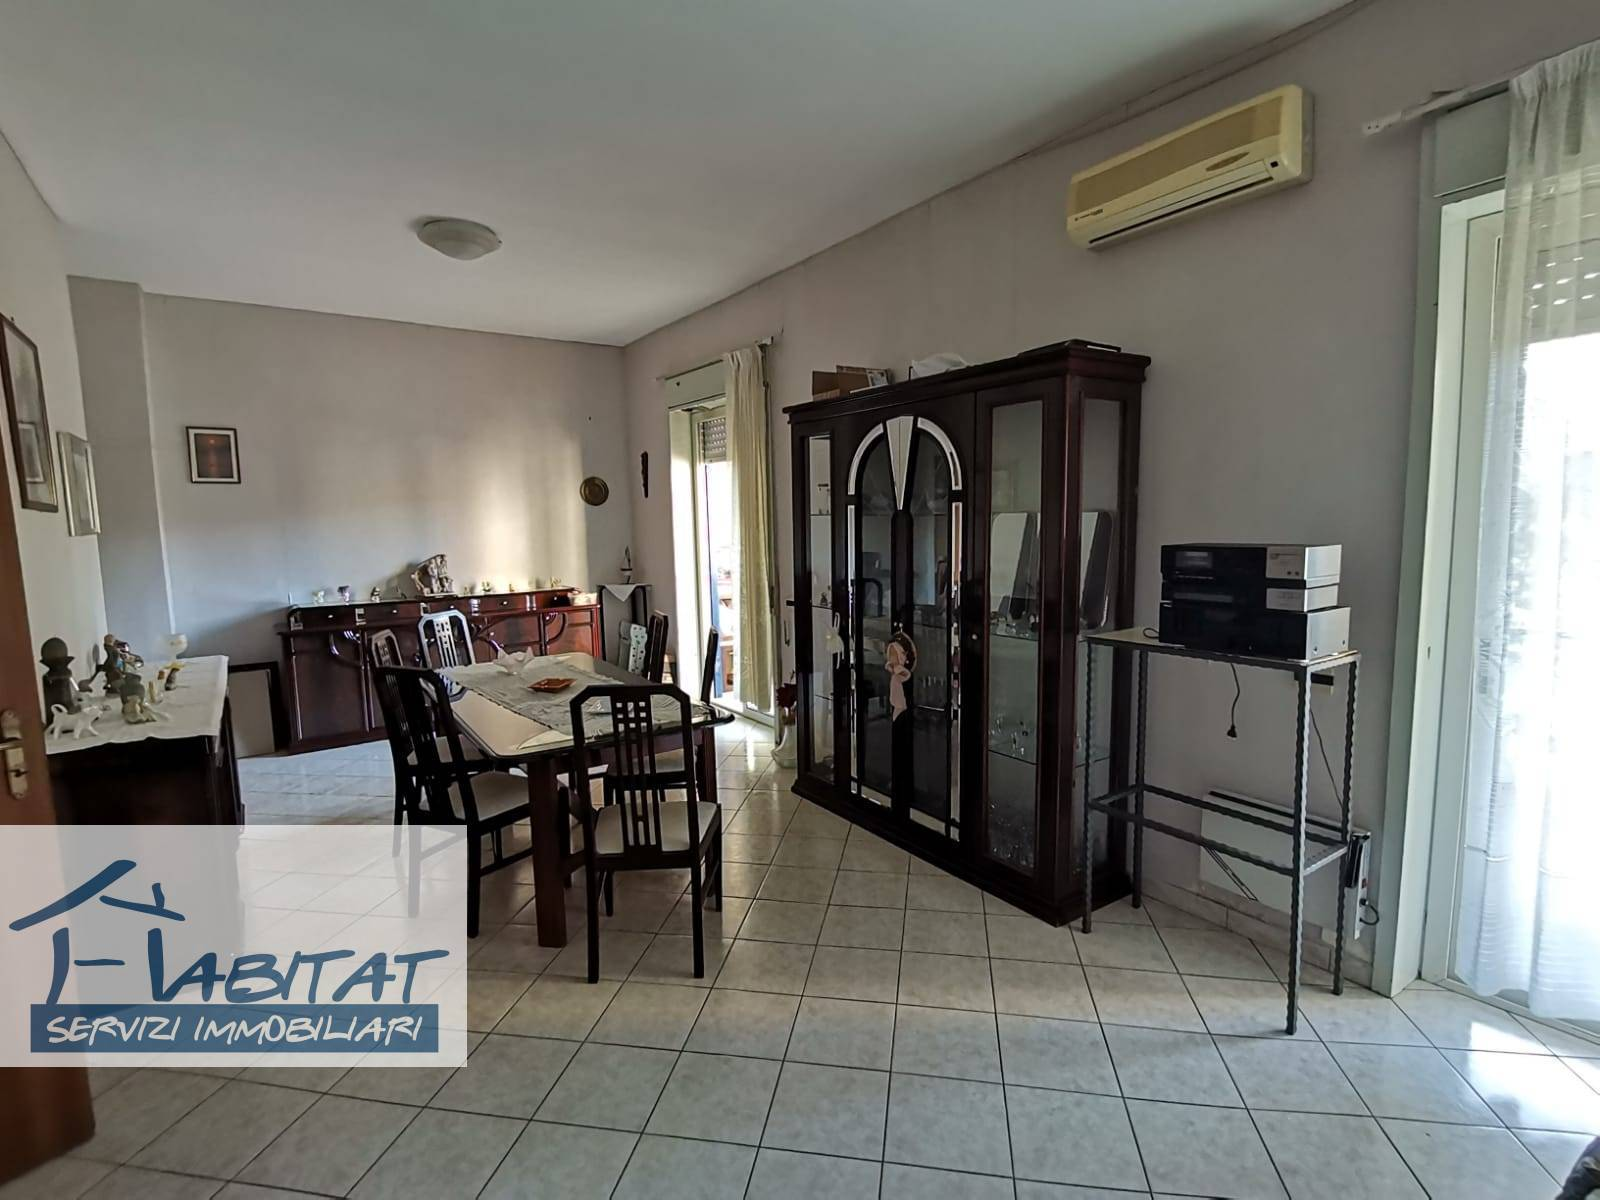 Appartamento in vendita a Contrada Fontanelle, Agrigento (AG)